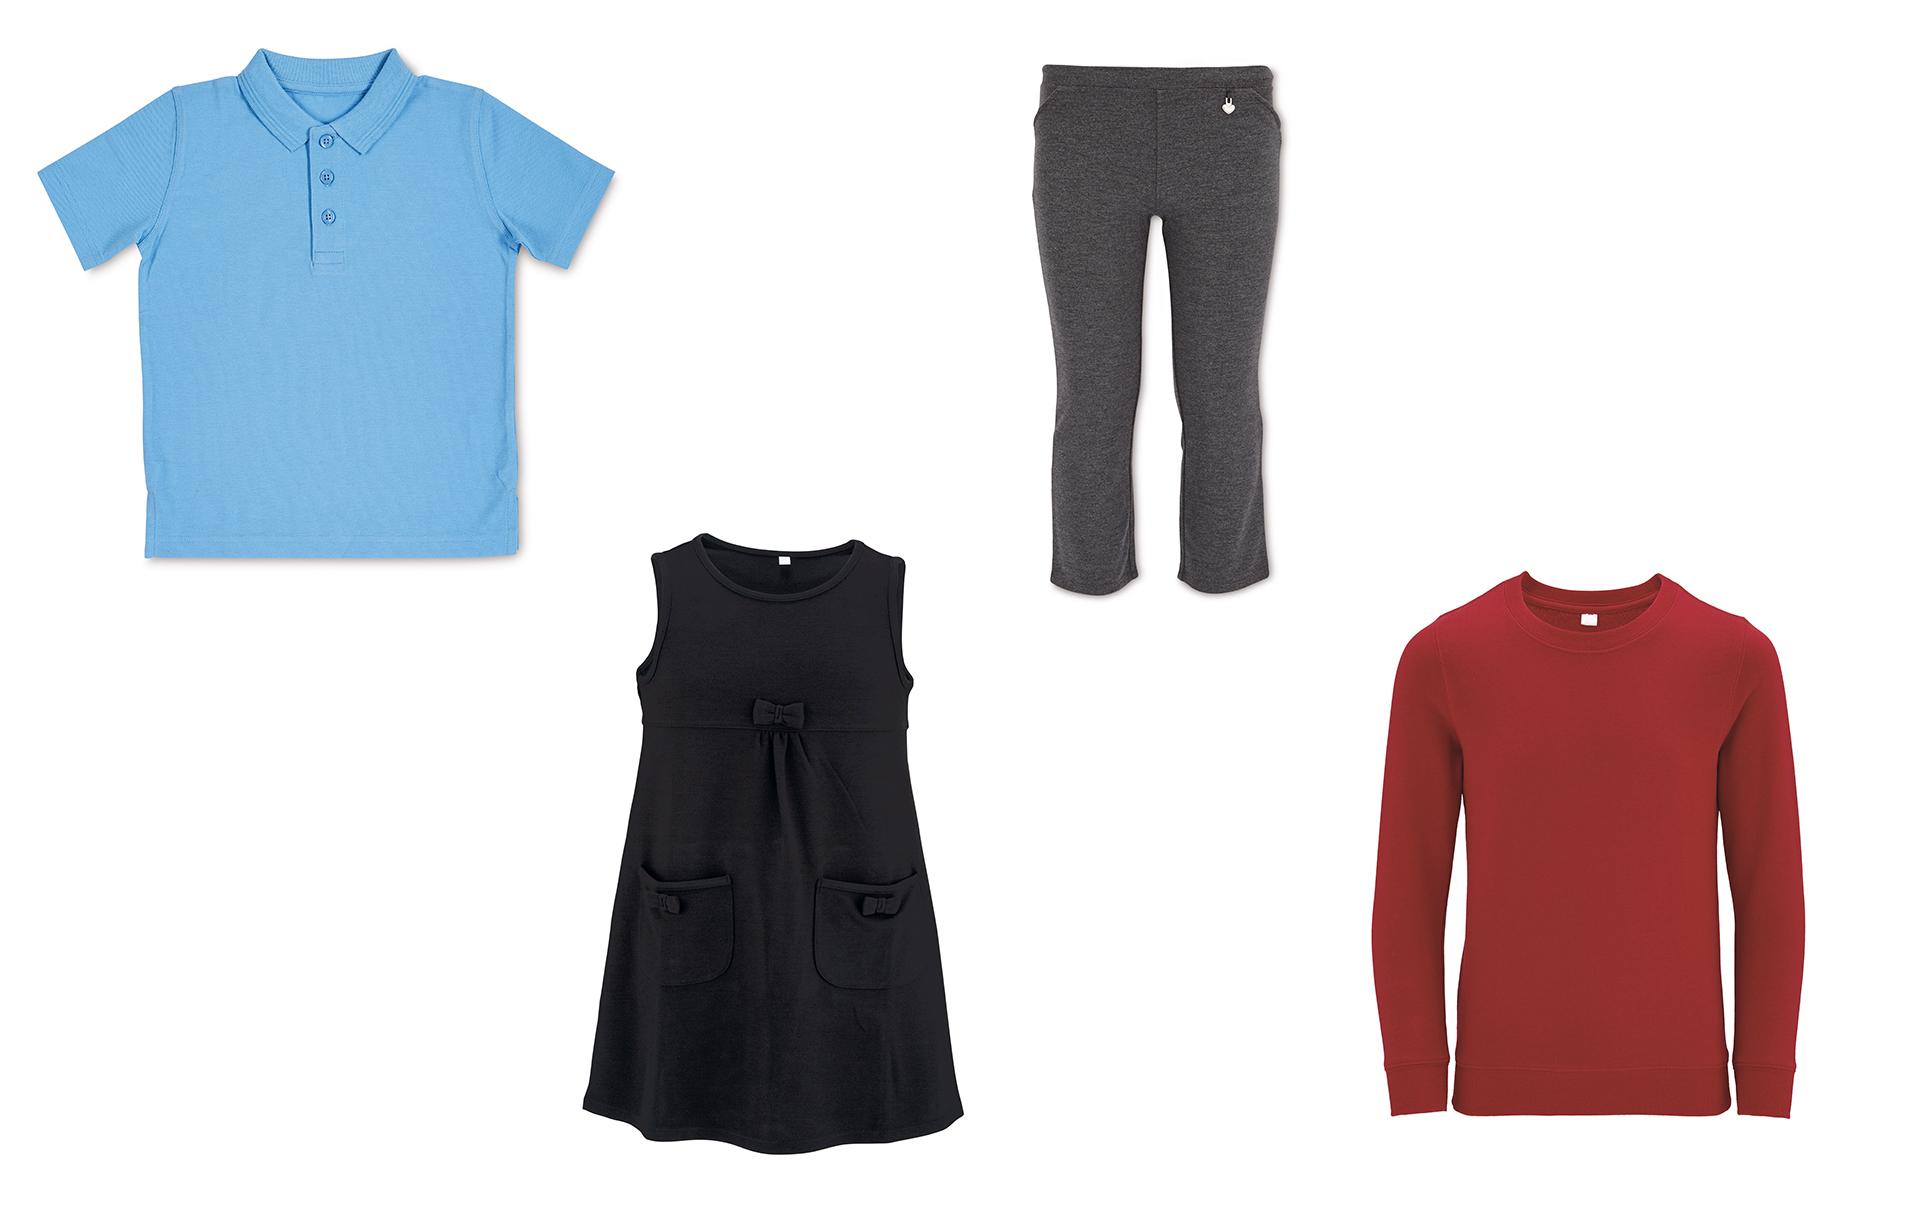 Boys Girls Kid Children Unisex Casual School Uniform Lot PE 100/% Cotton Shorts ↔